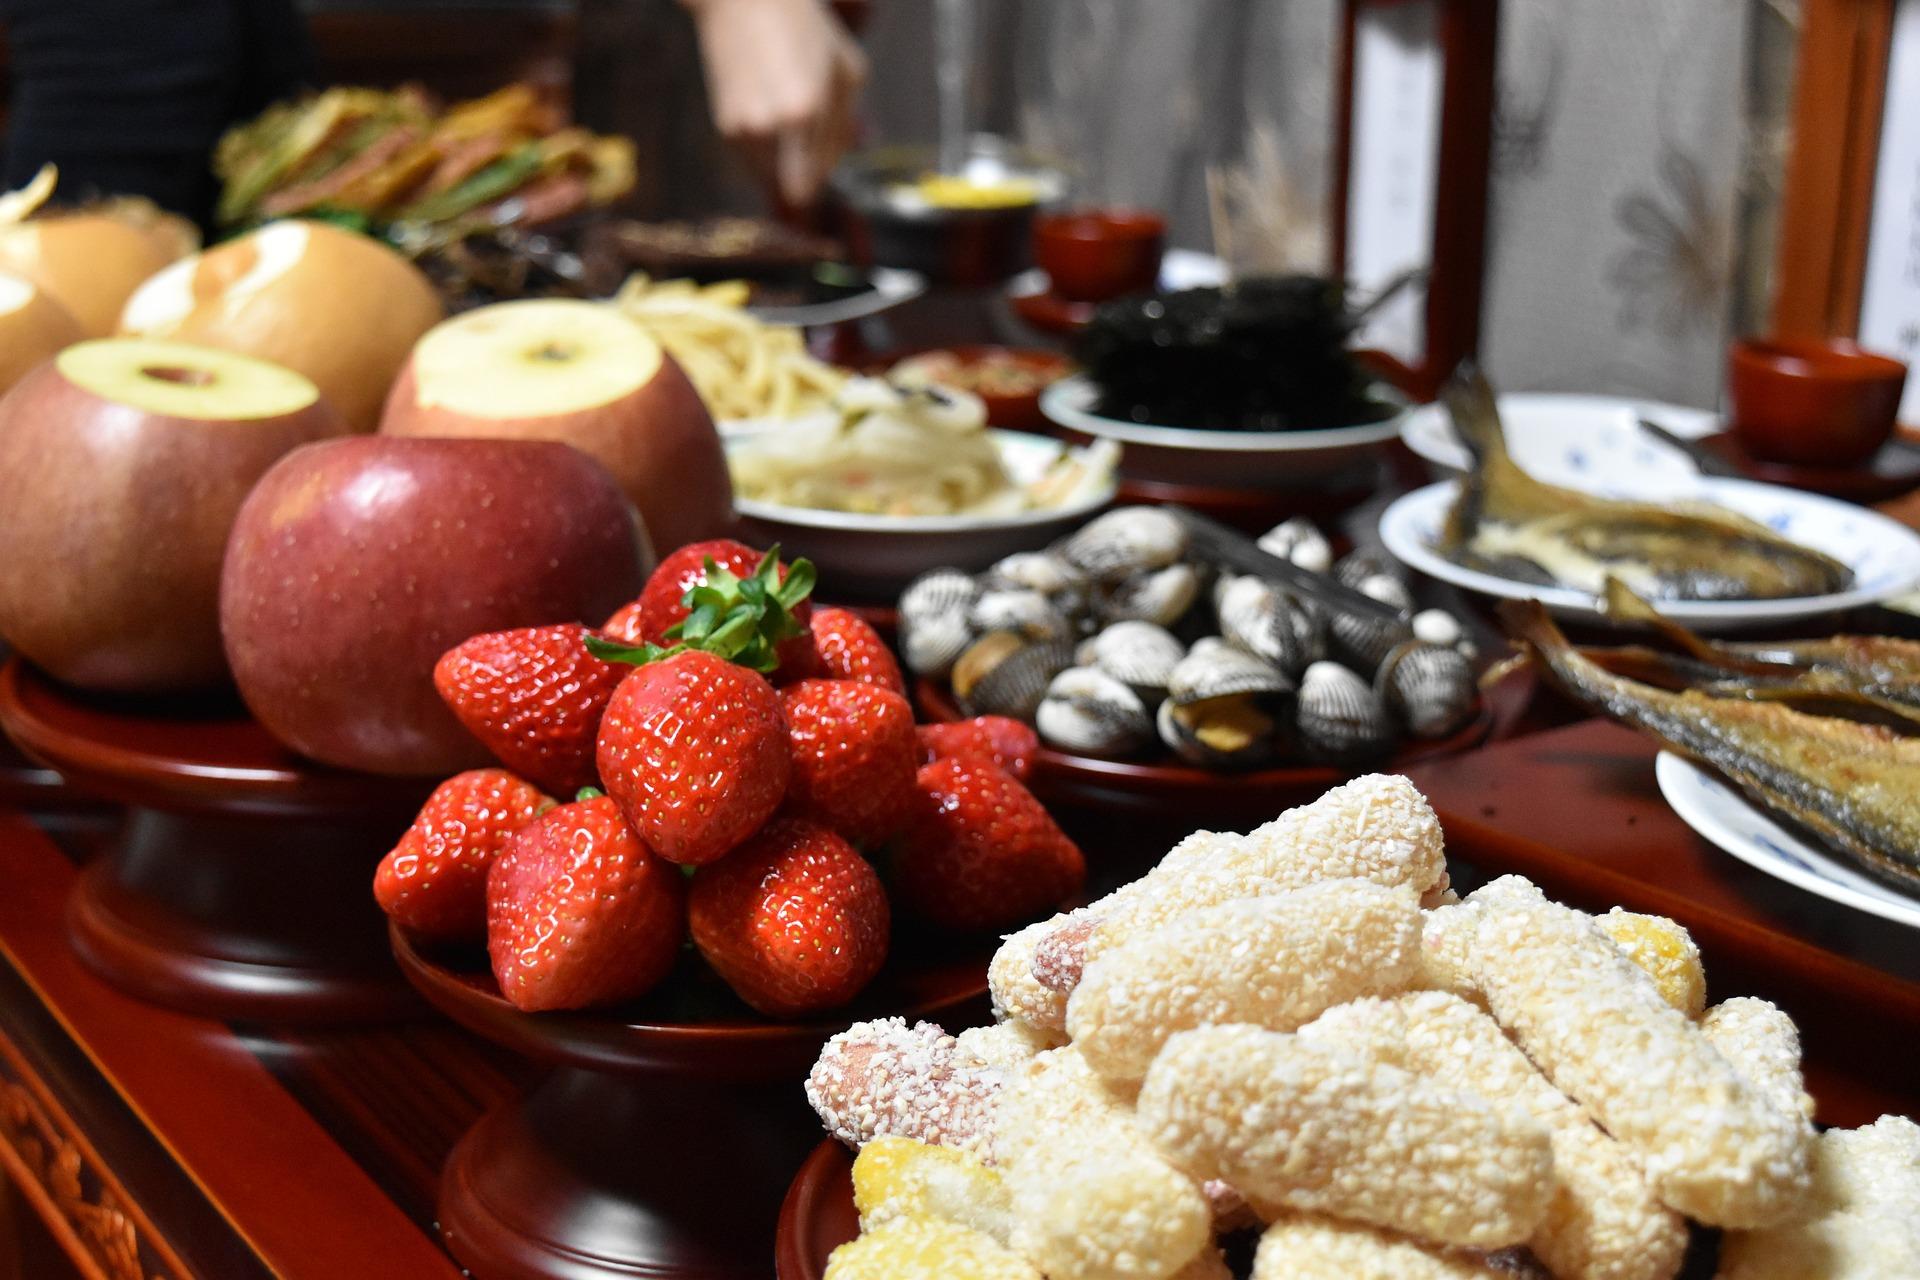 Tempat Terbaik untuk Merayakan Buka Bersama di Bulan Ramadhan